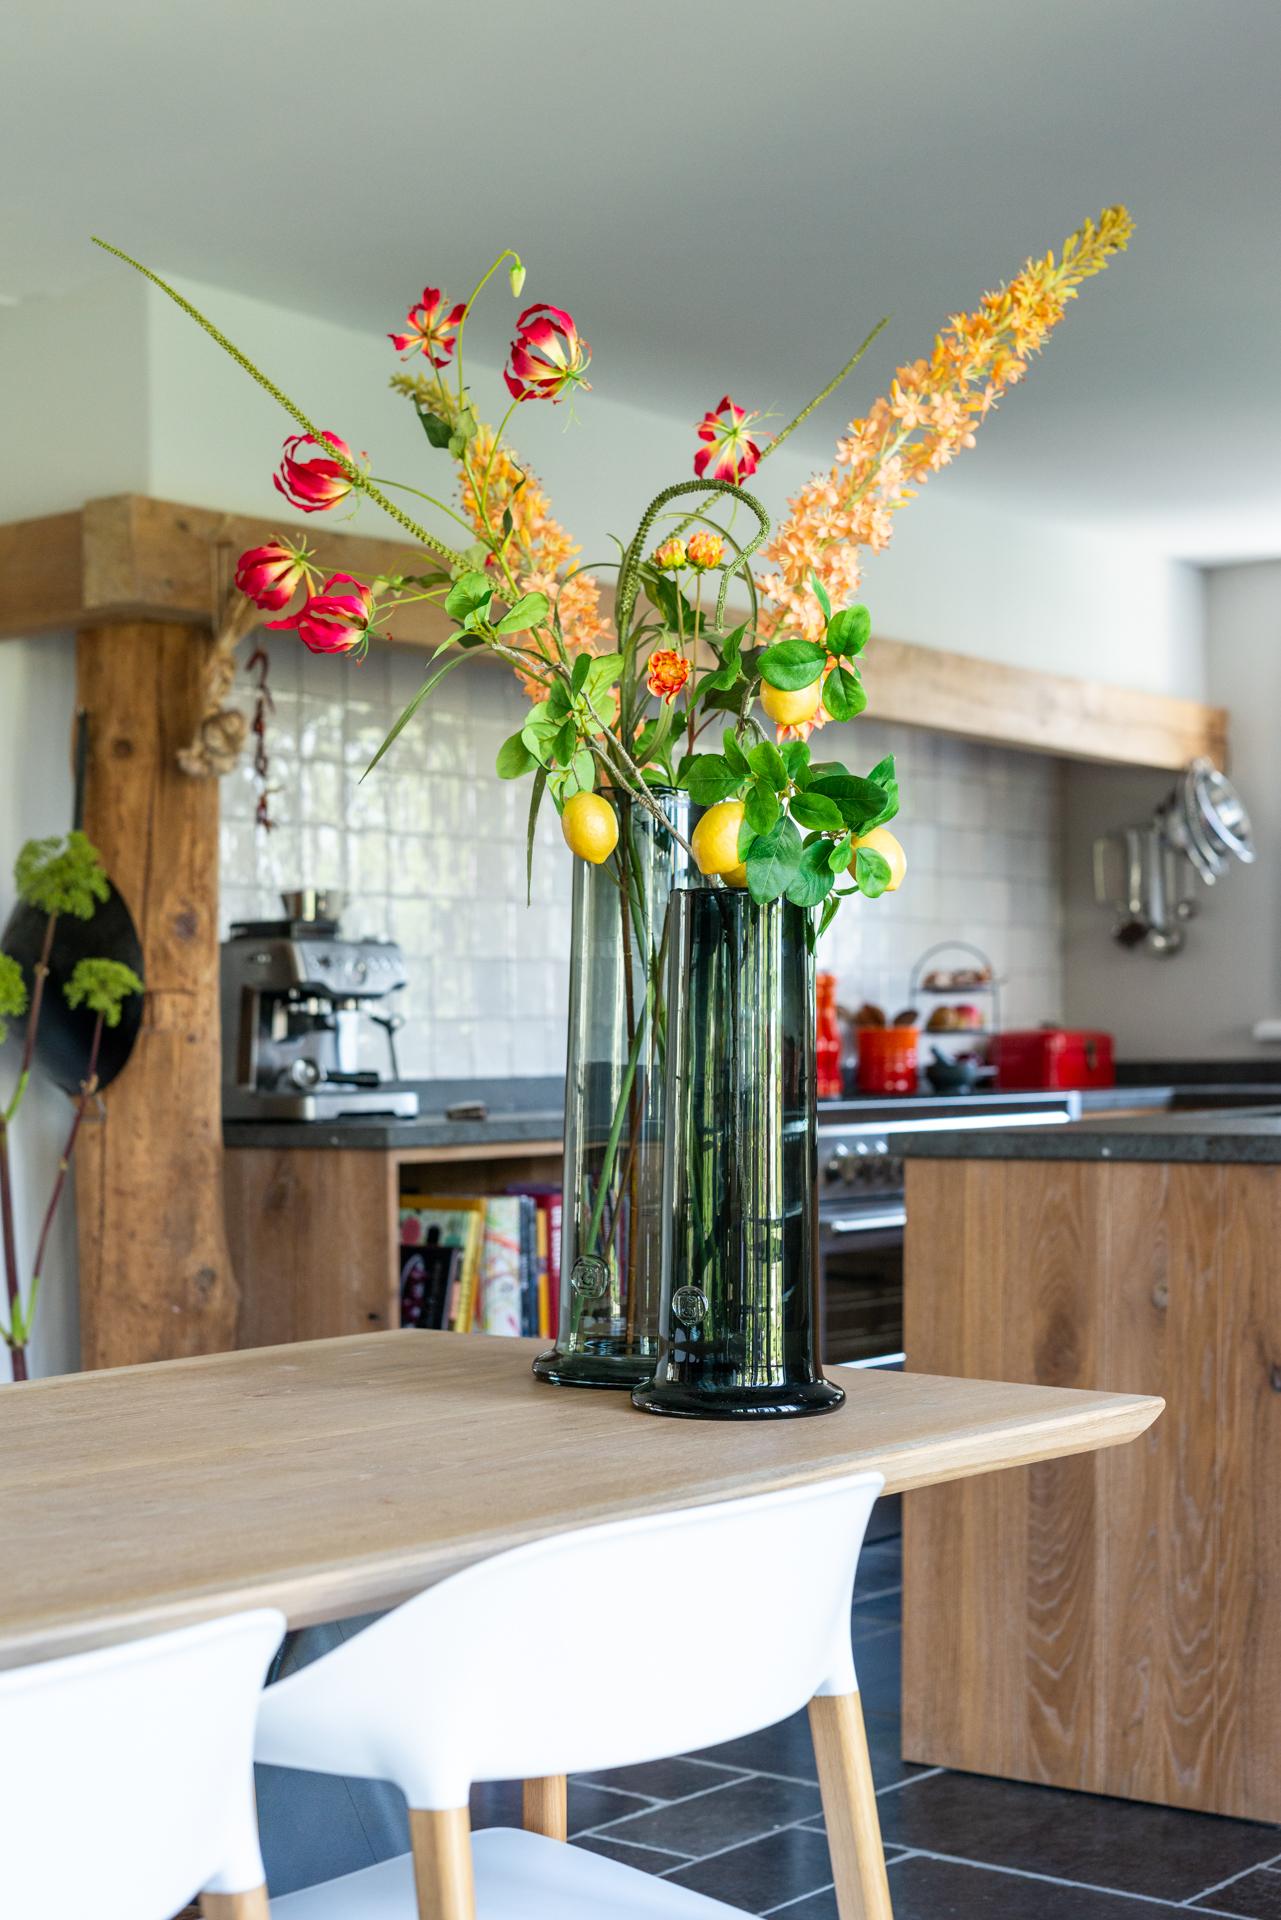 Massief eiken keuken met spaans hardsteen met Steel fornuis en Miele apparatuur